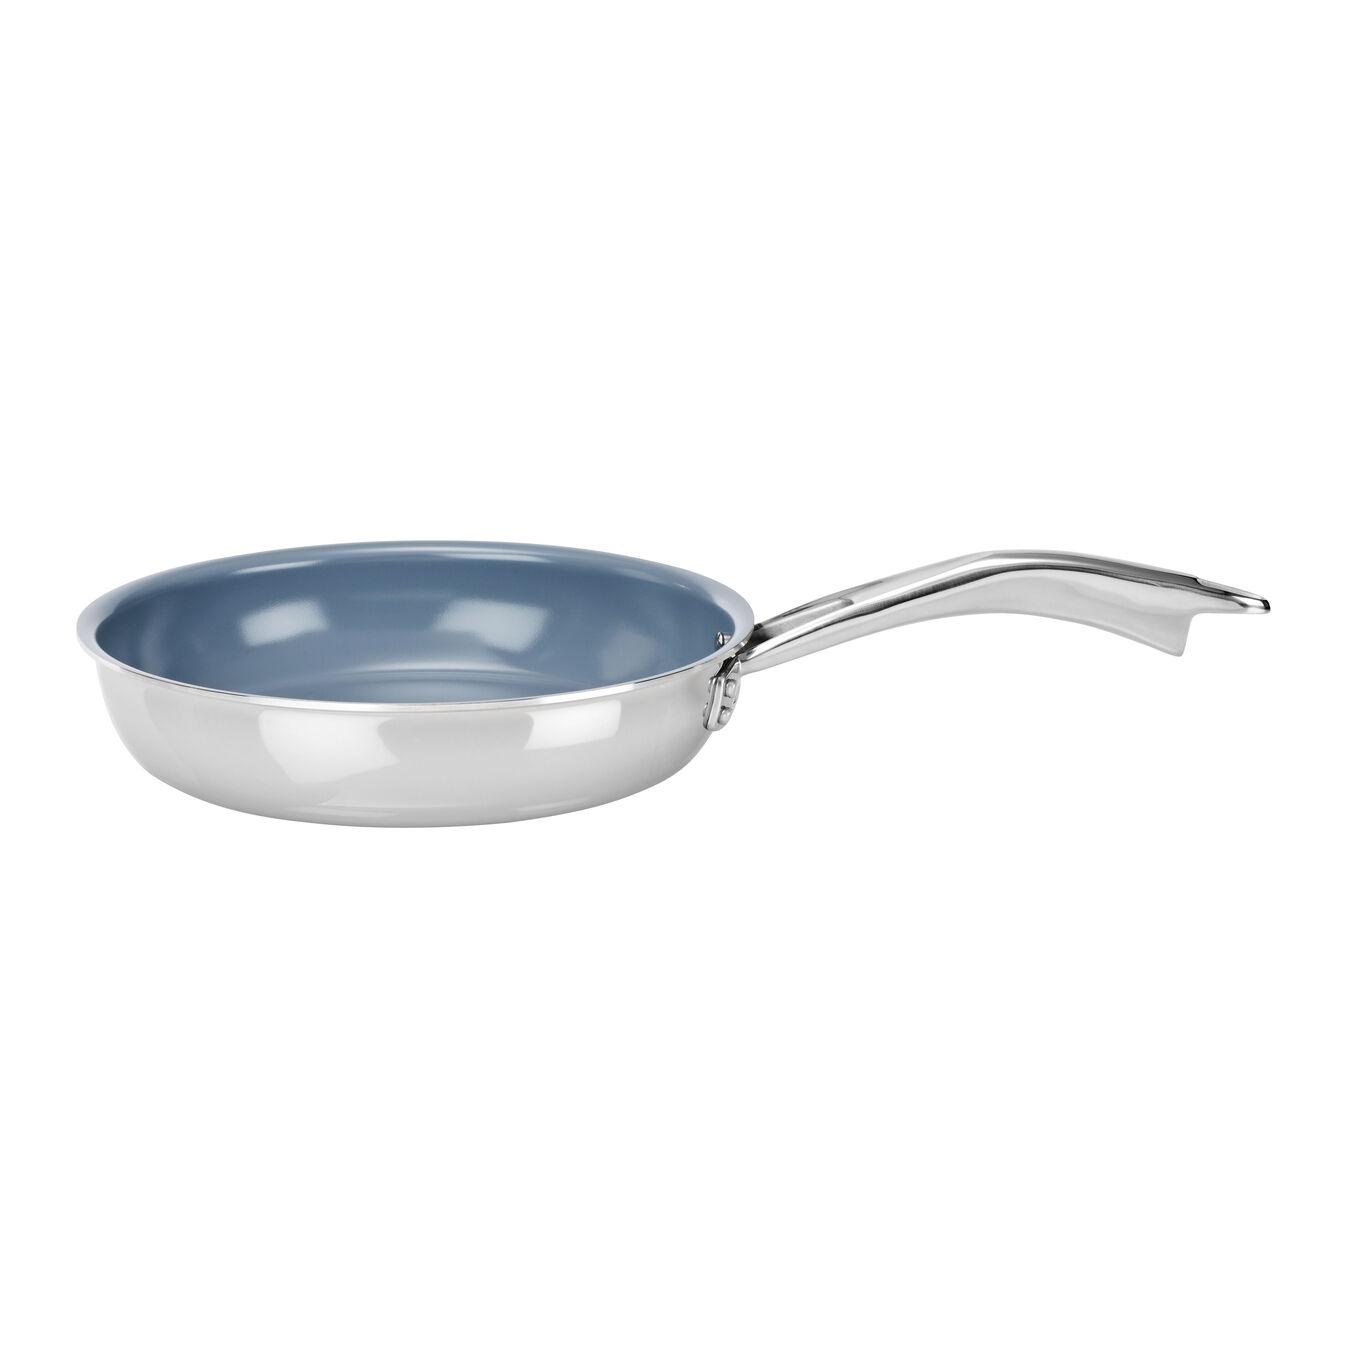 30 cm / 12 inch Frying pan,,large 1